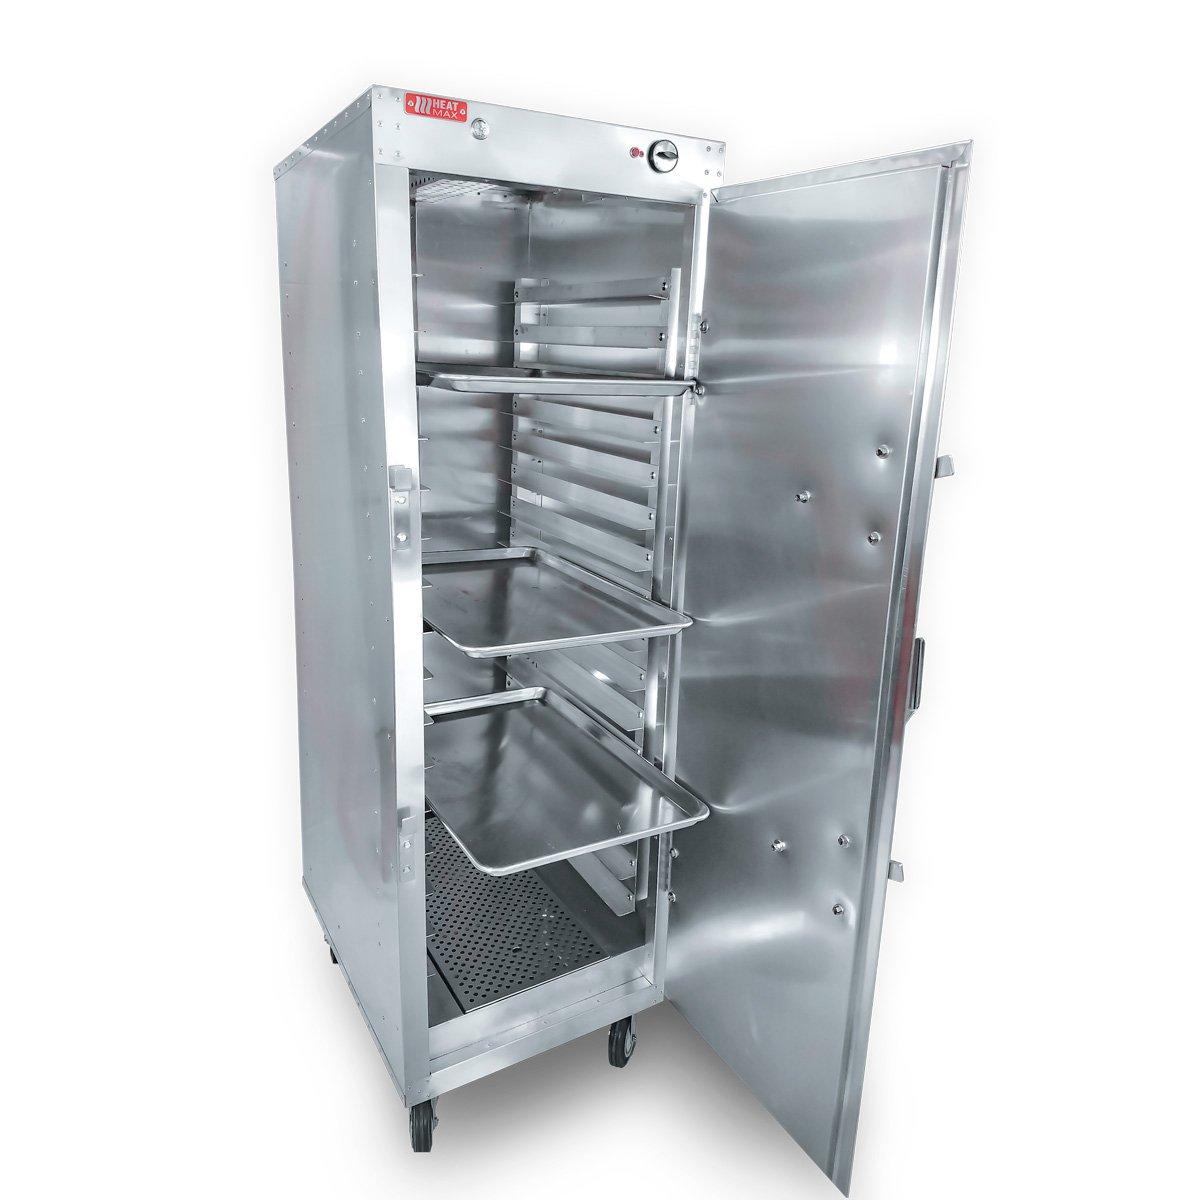 Amazon.com: HeatMax 6\' Commercial Warming Cabinet Bread Pastry Dough ...